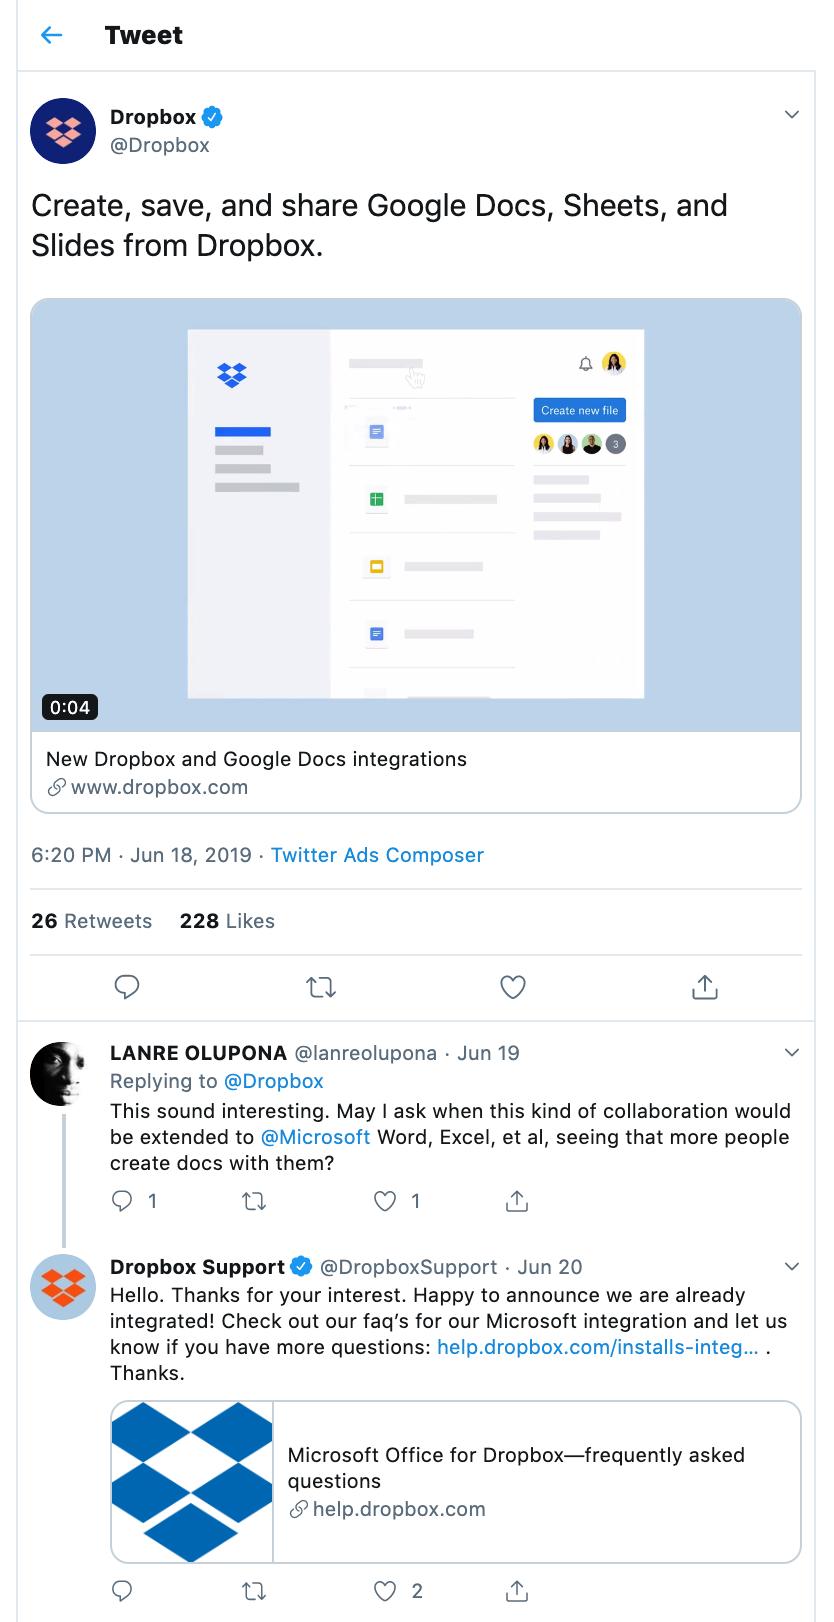 Dropbox Twitter Ad details